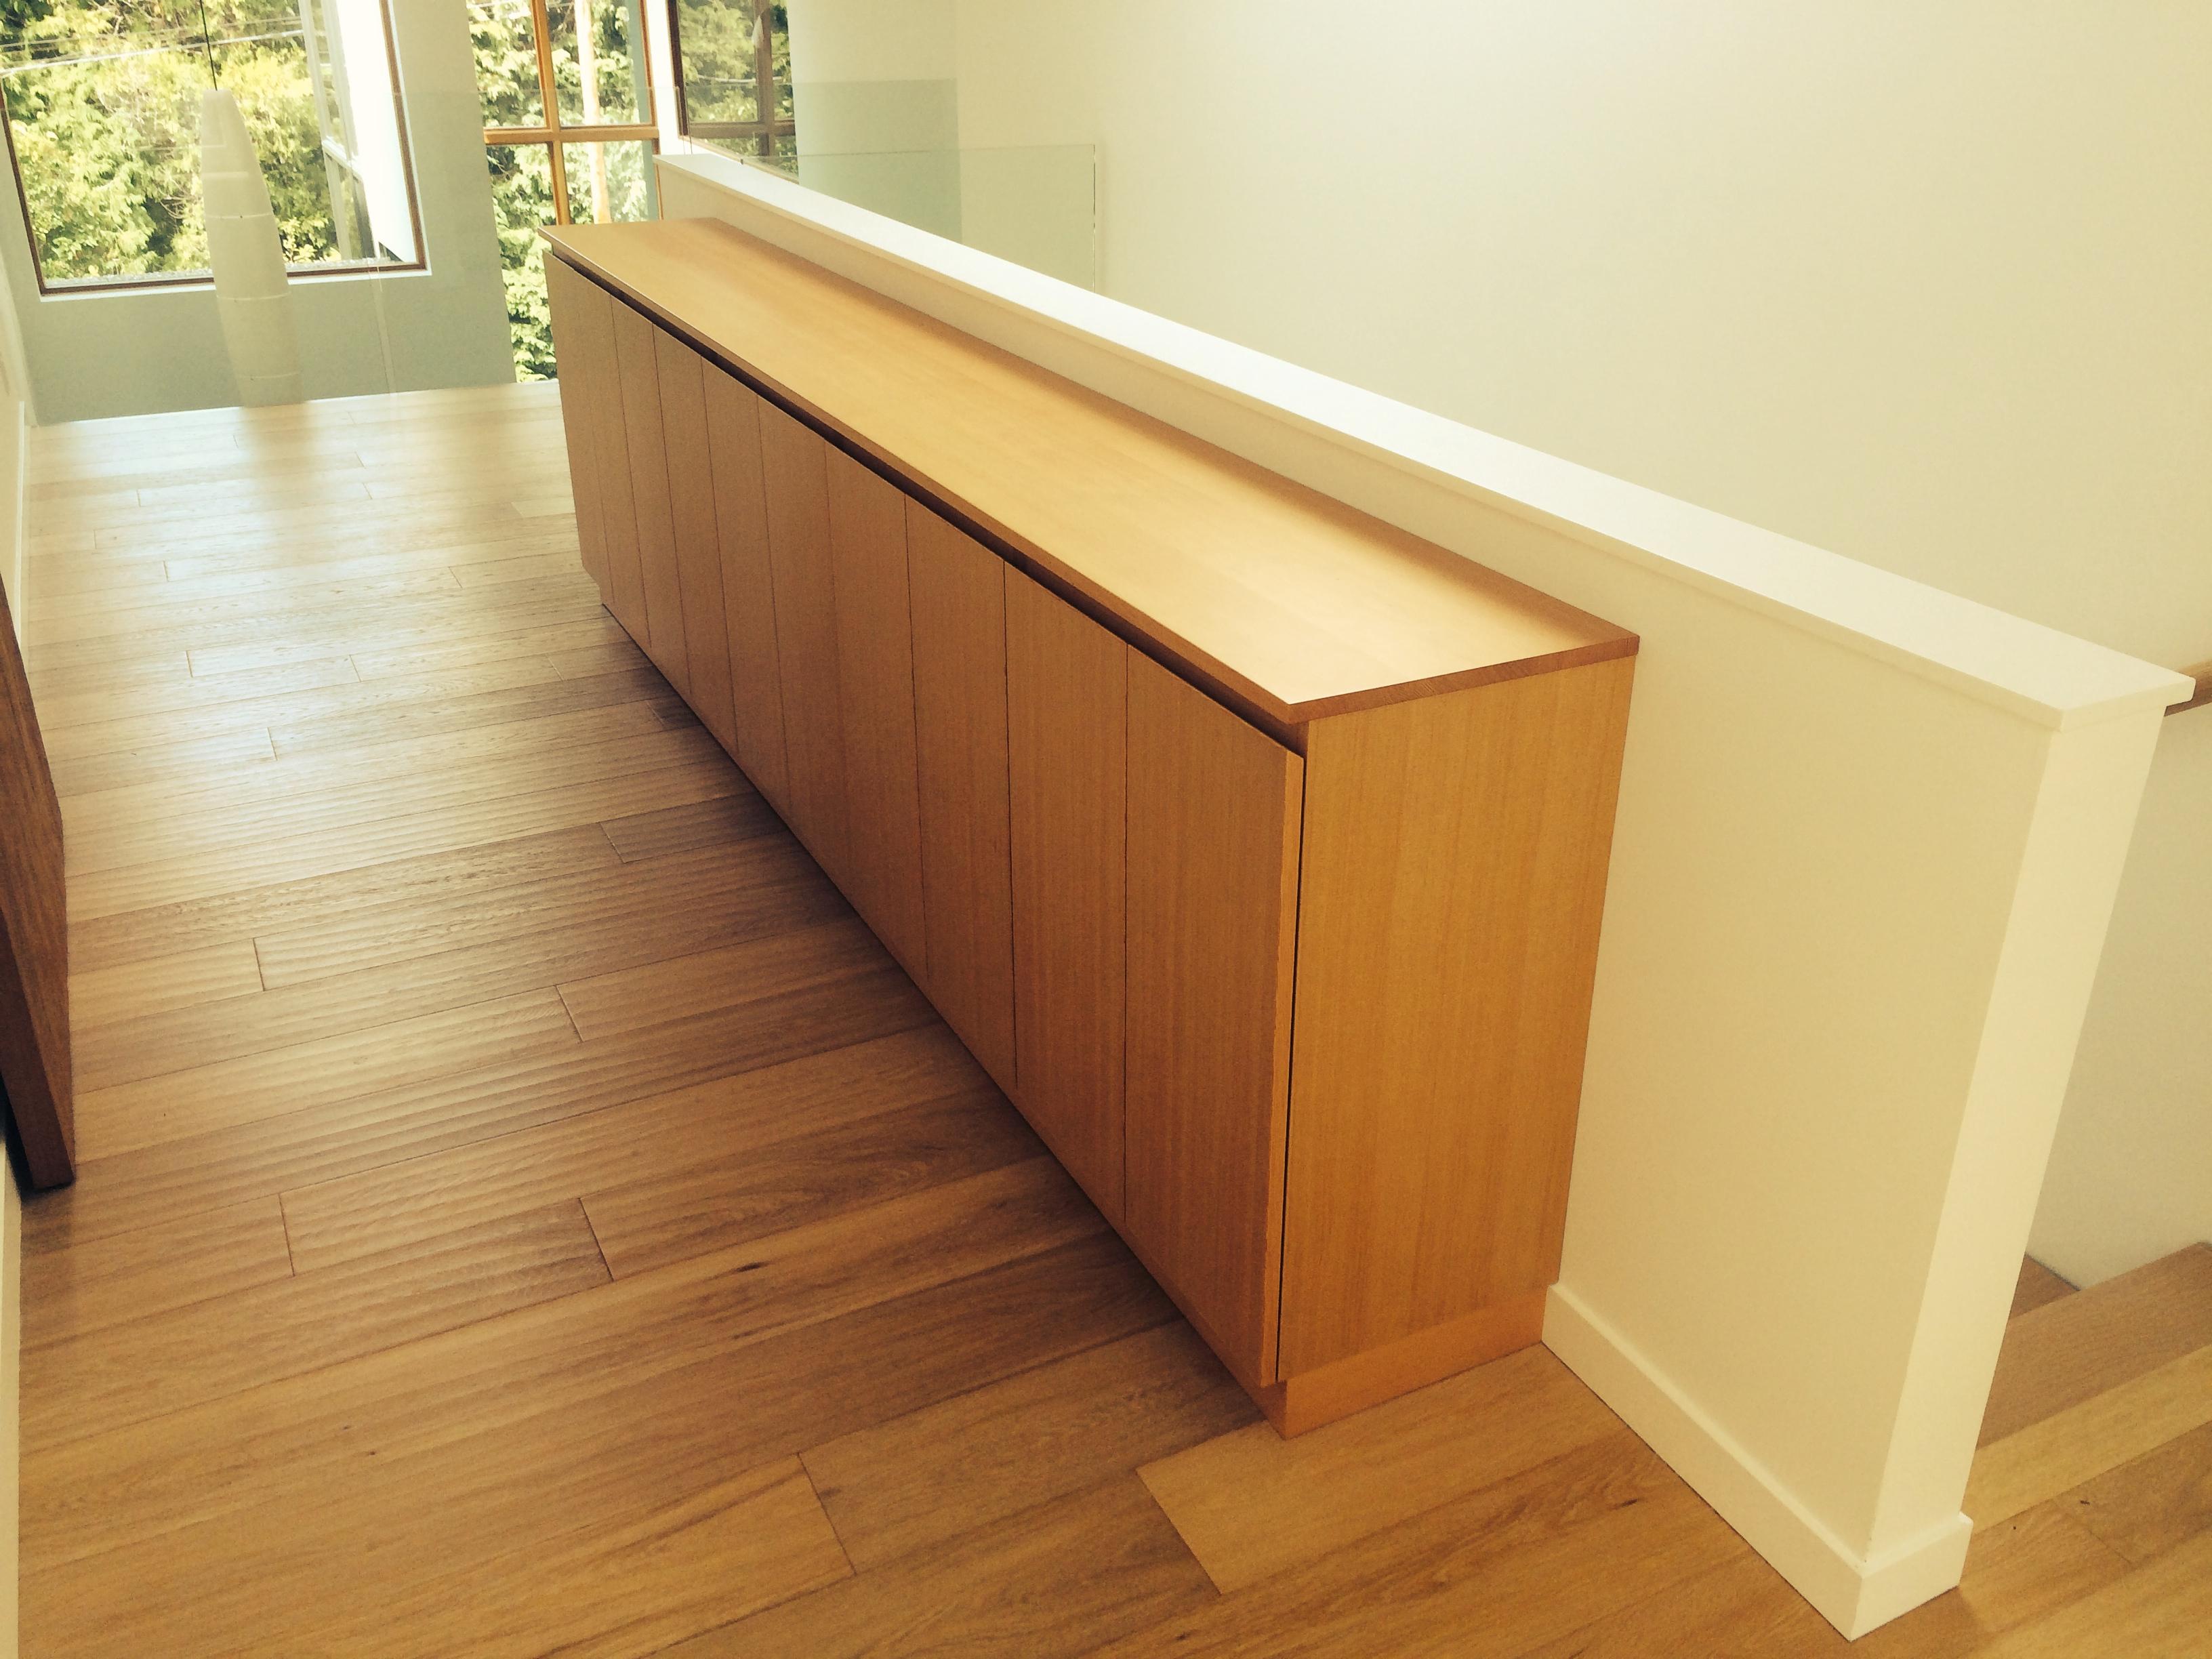 Transit Rd. Linen Cabinet